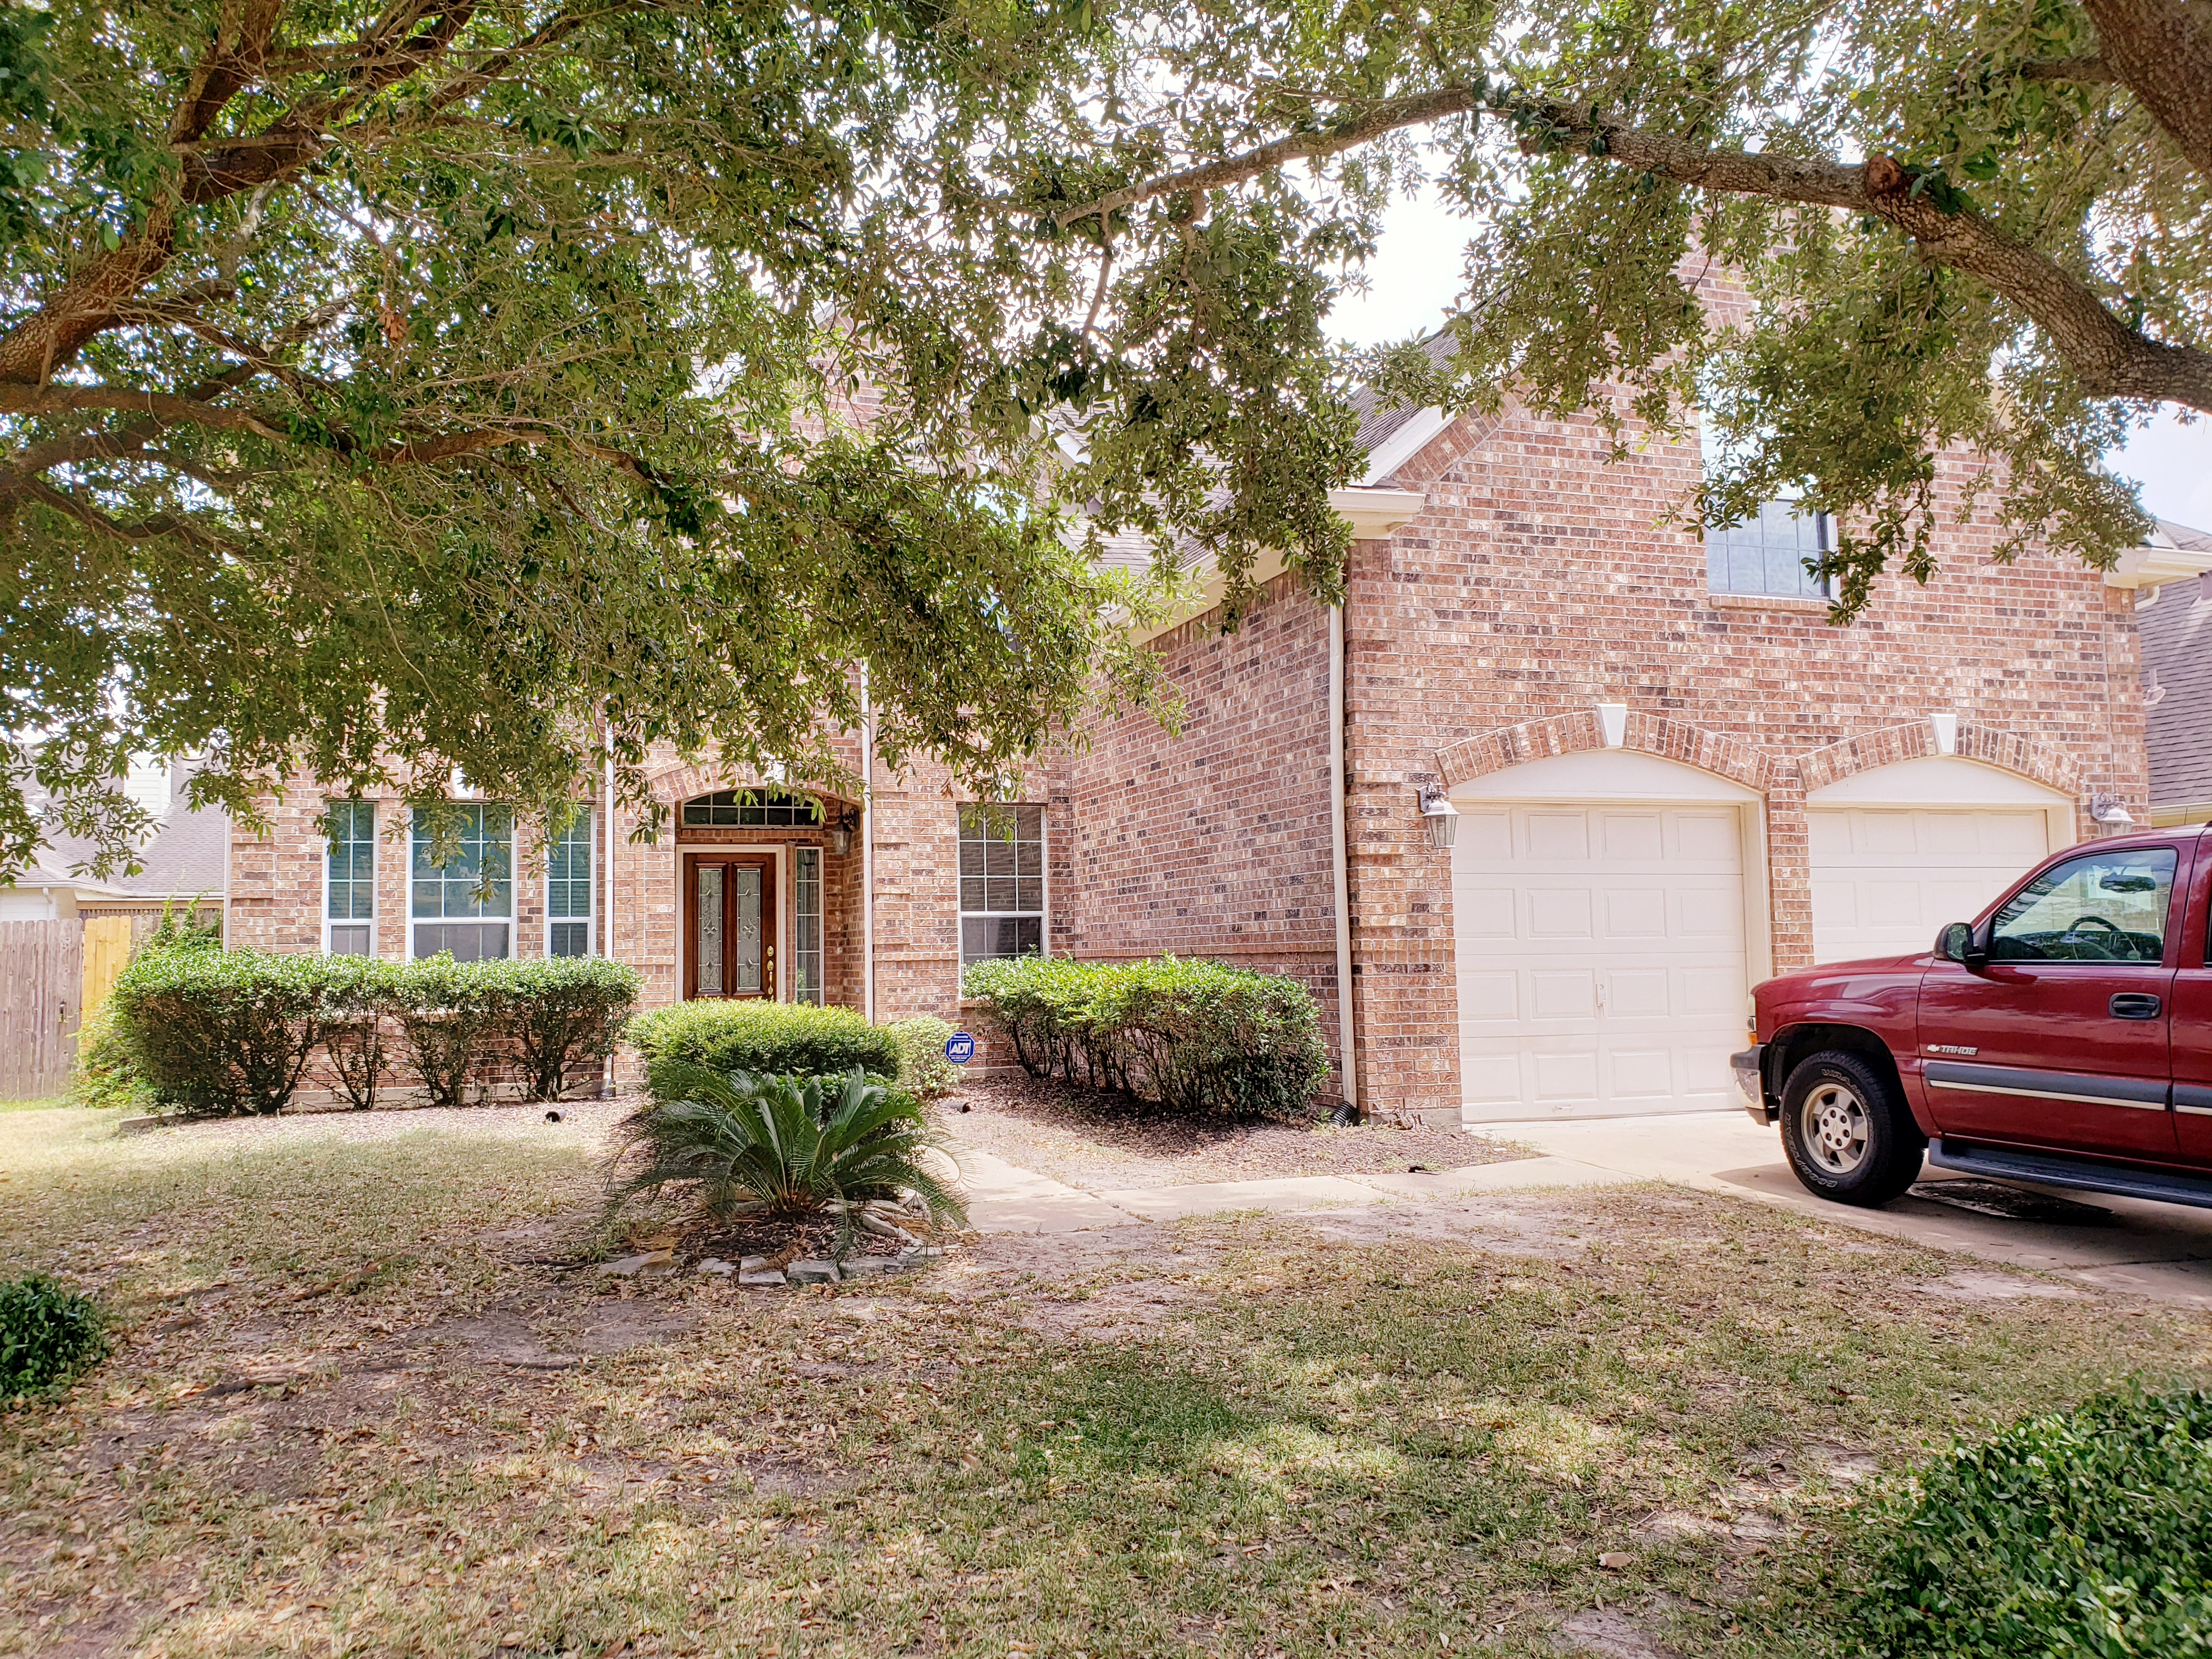 Photo of 7506 Parkcross Place, Cypress, TX 77433